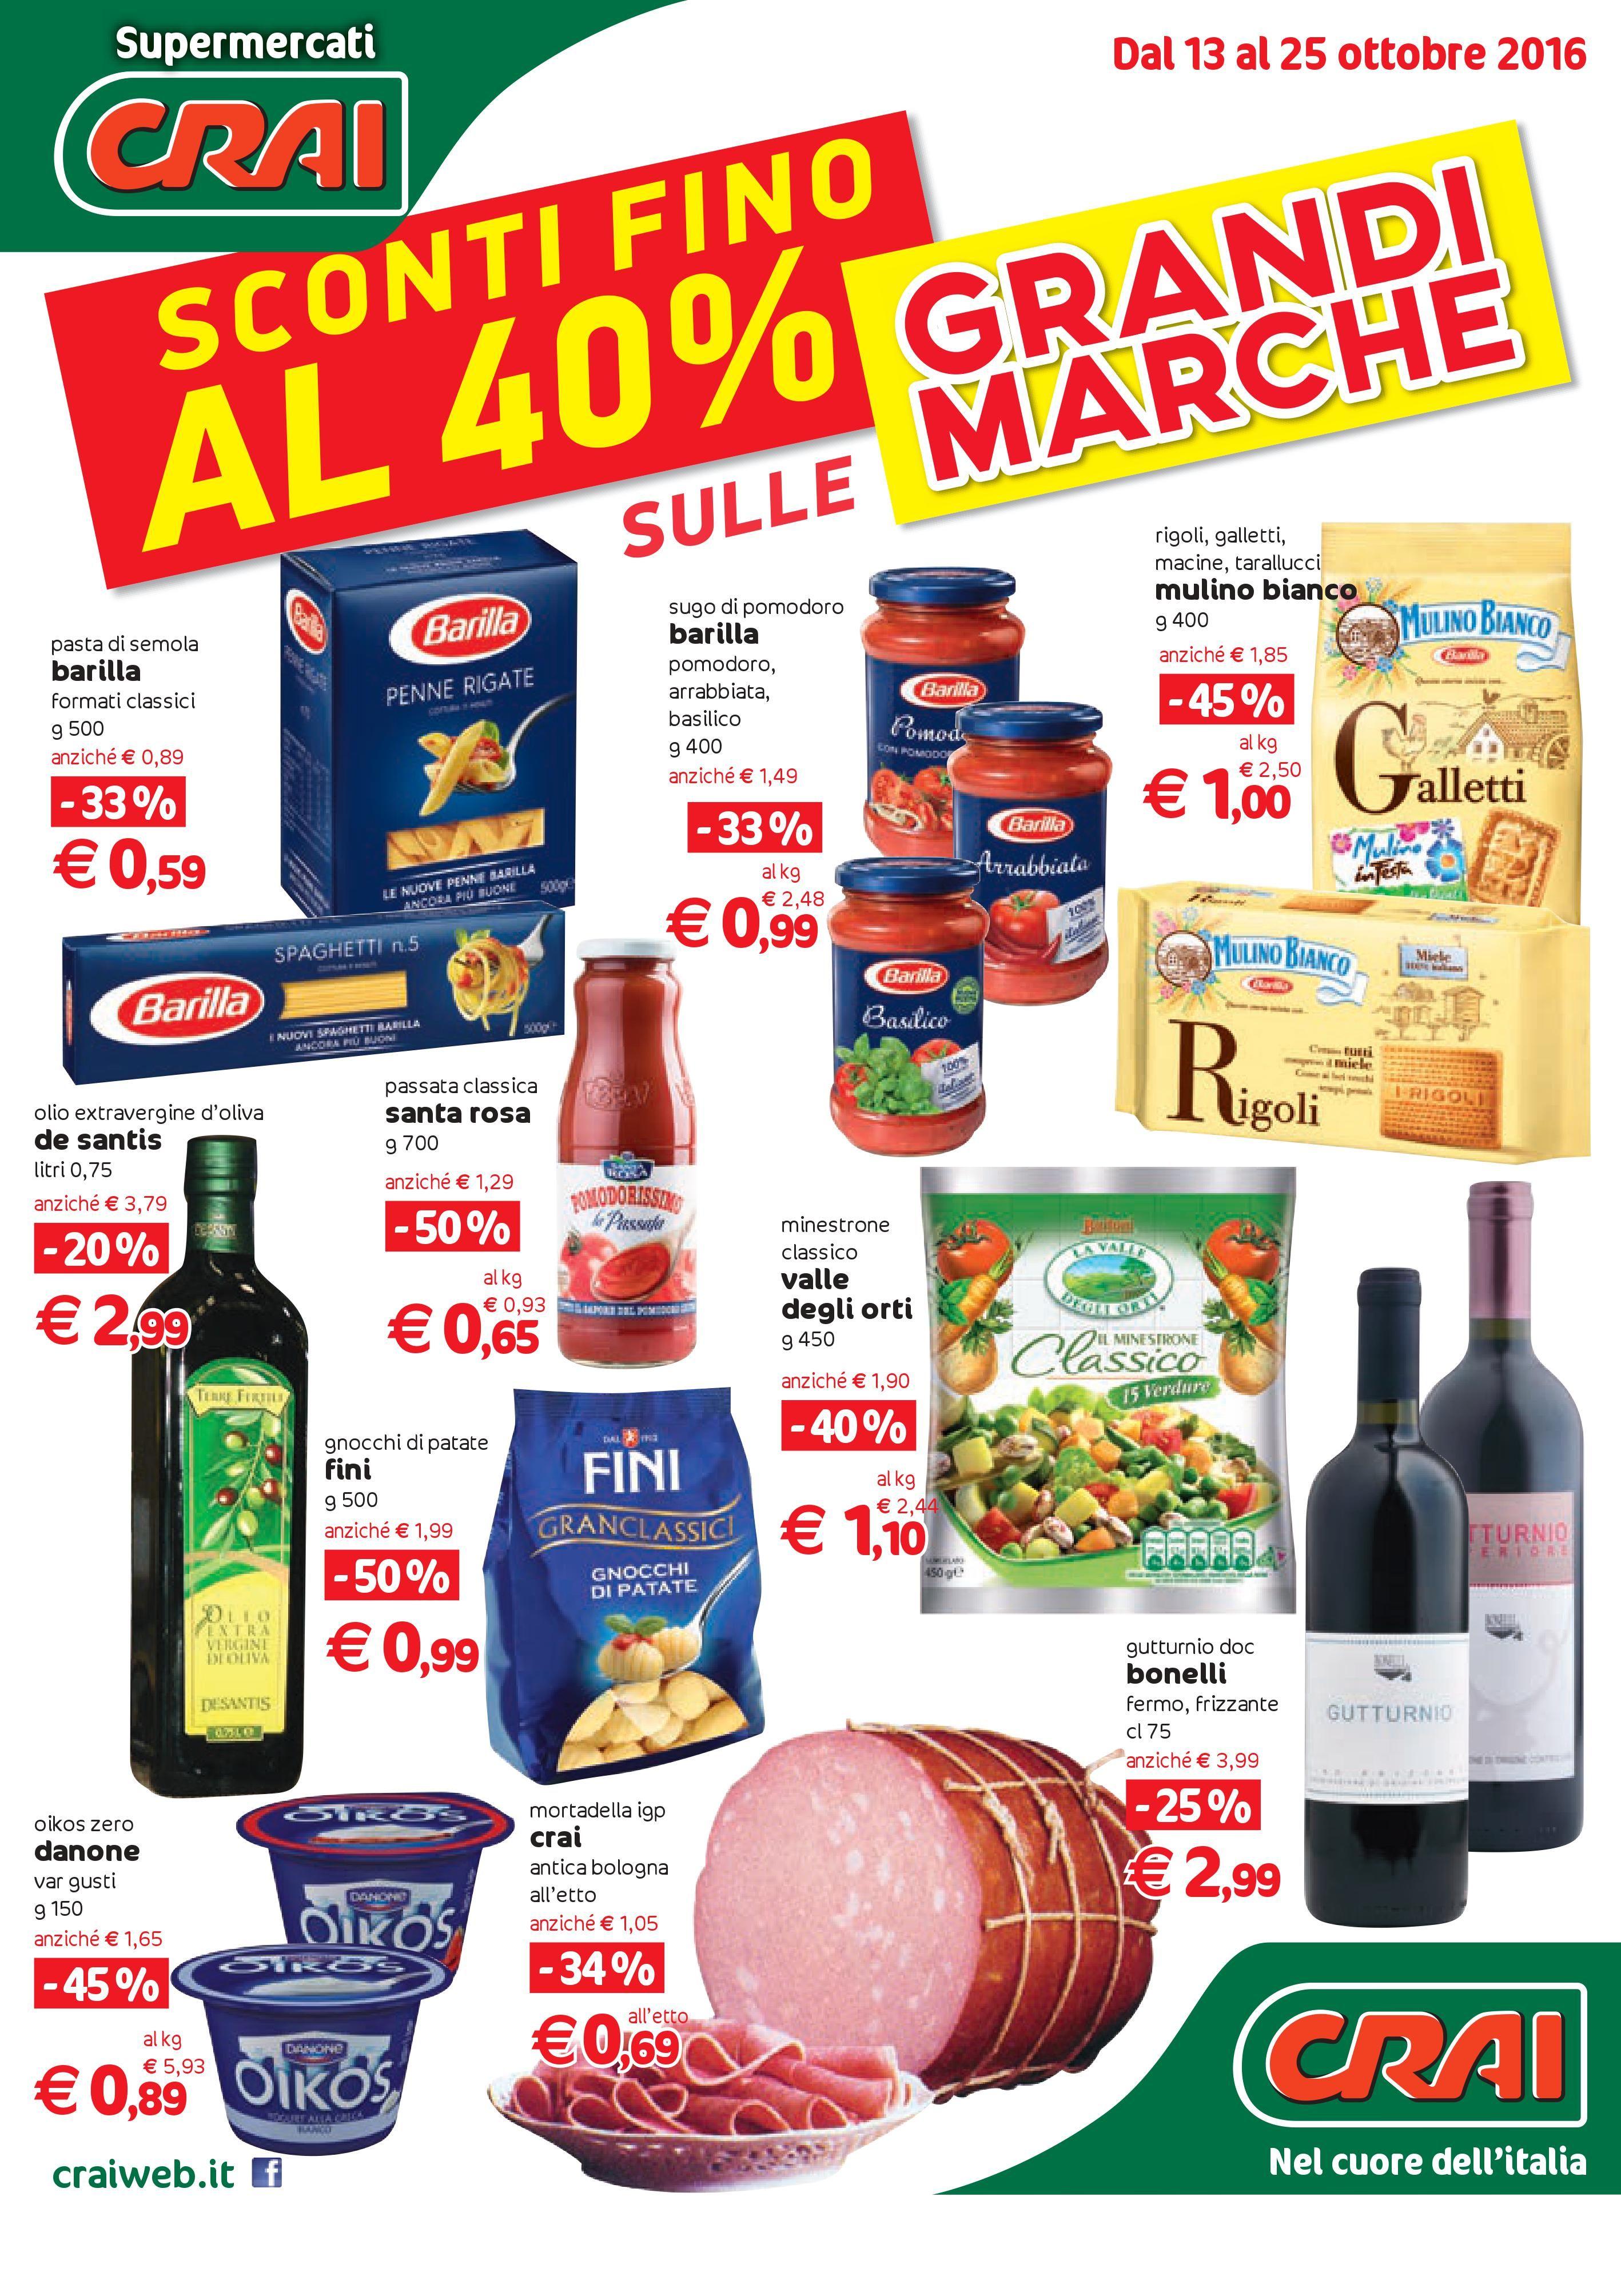 Volantino CRAI Supermercati - http://www.volantinoit.com/crai ...